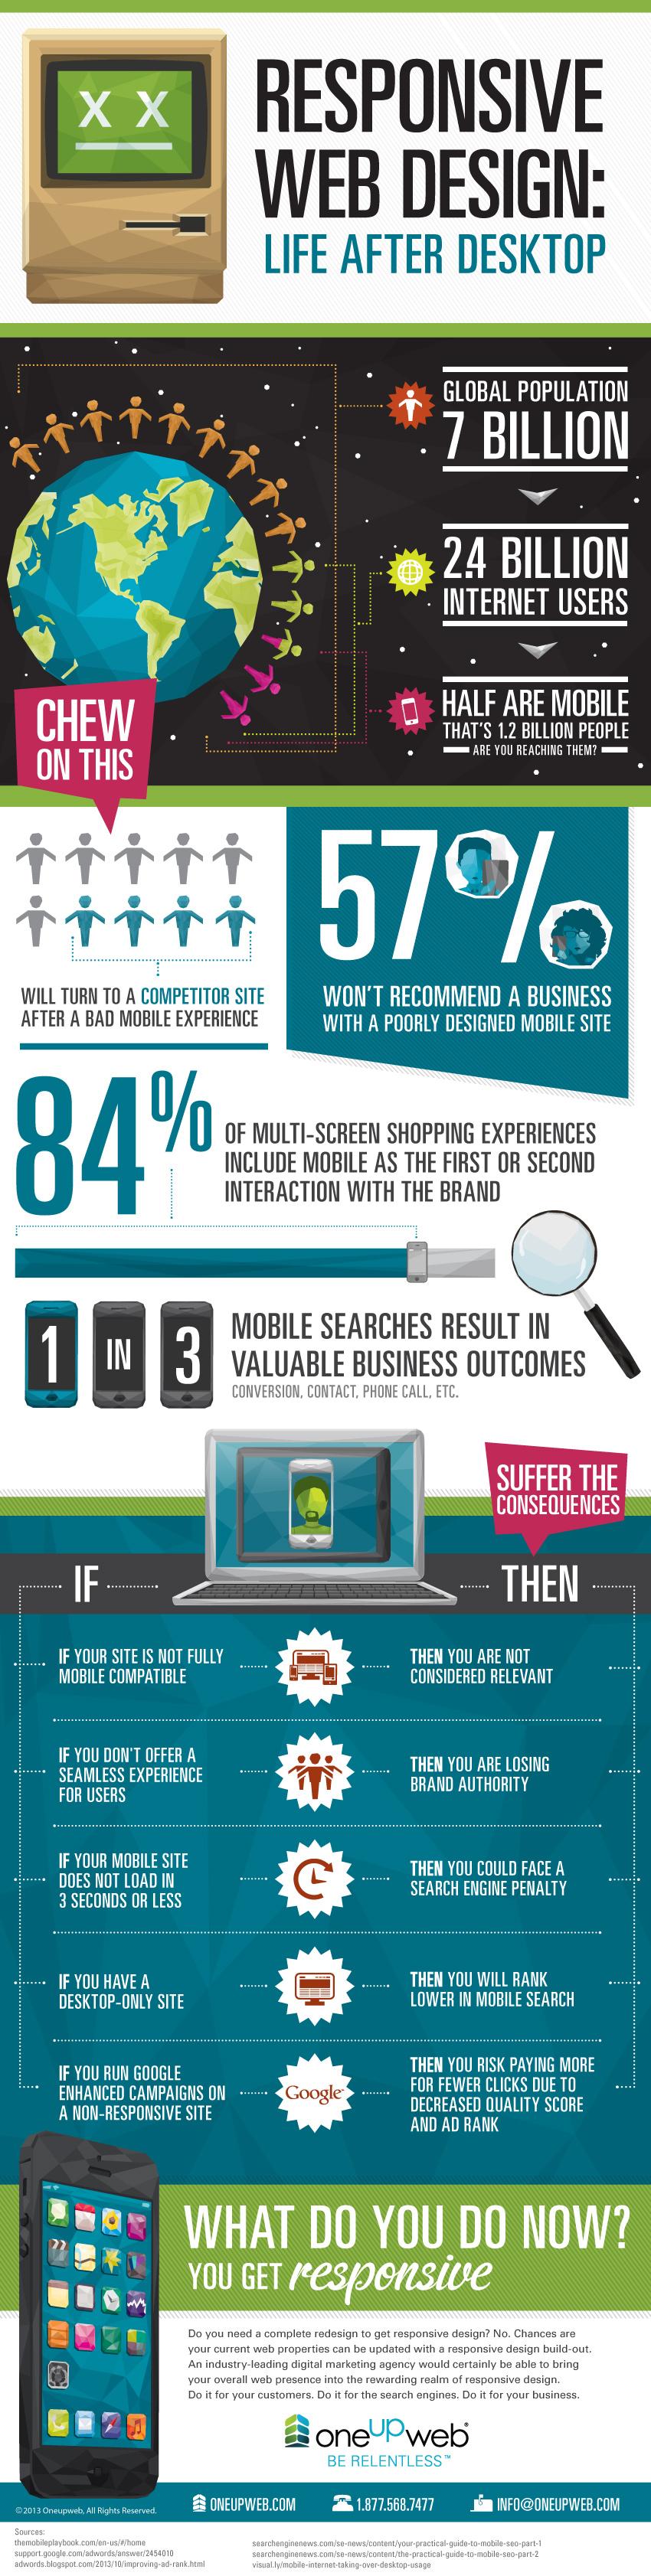 oneupweb_digital_marketing_responsive_design_infographic1